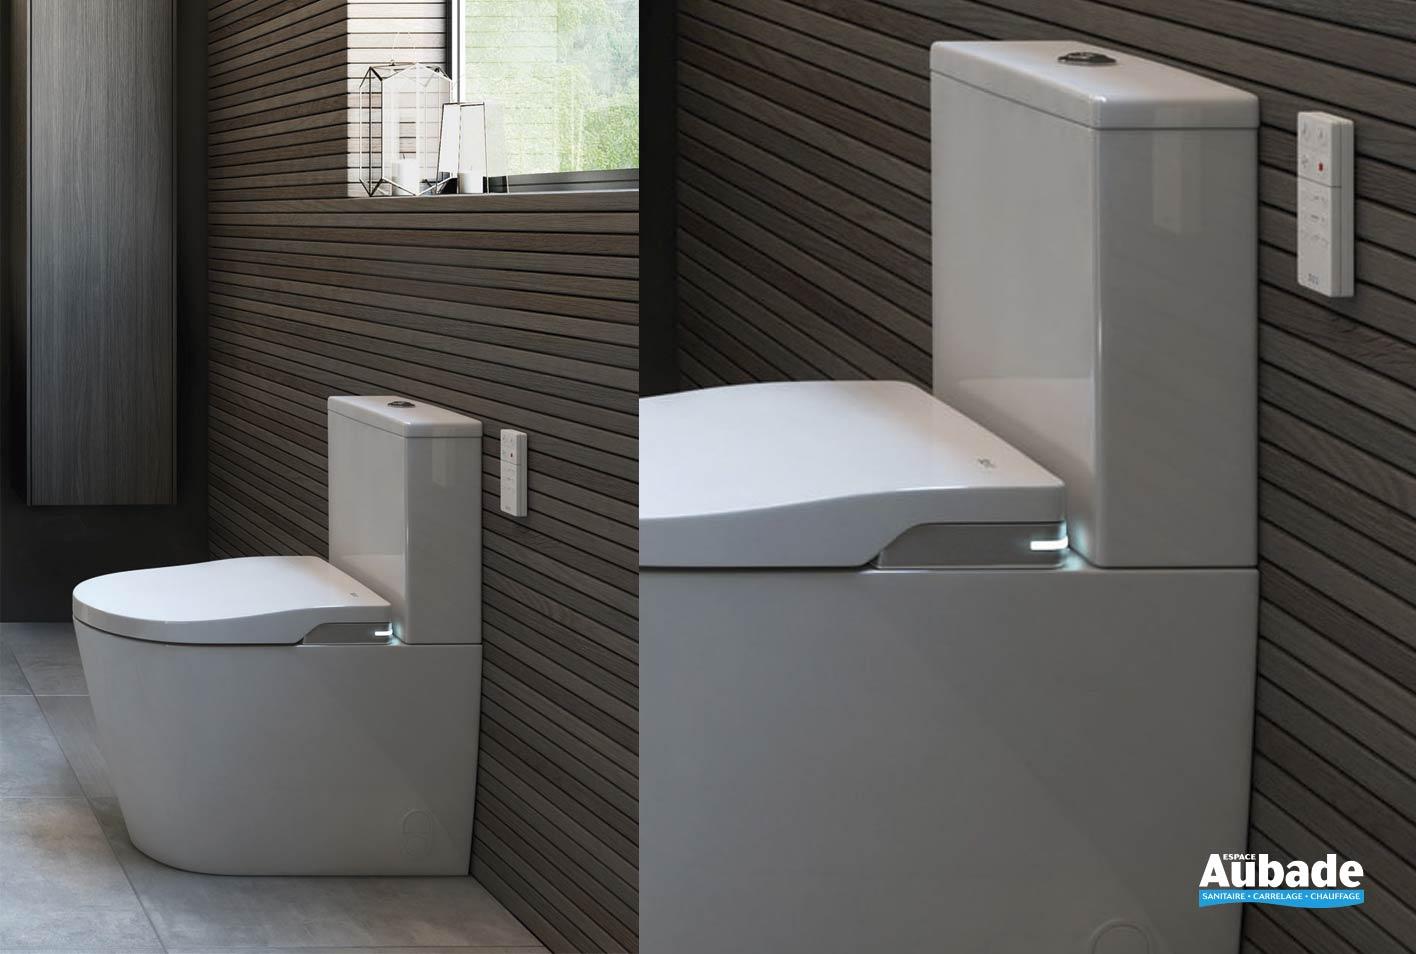 Wc Suspendu 4 Pieds wc lavant in-wash® inspira sur pied de roca